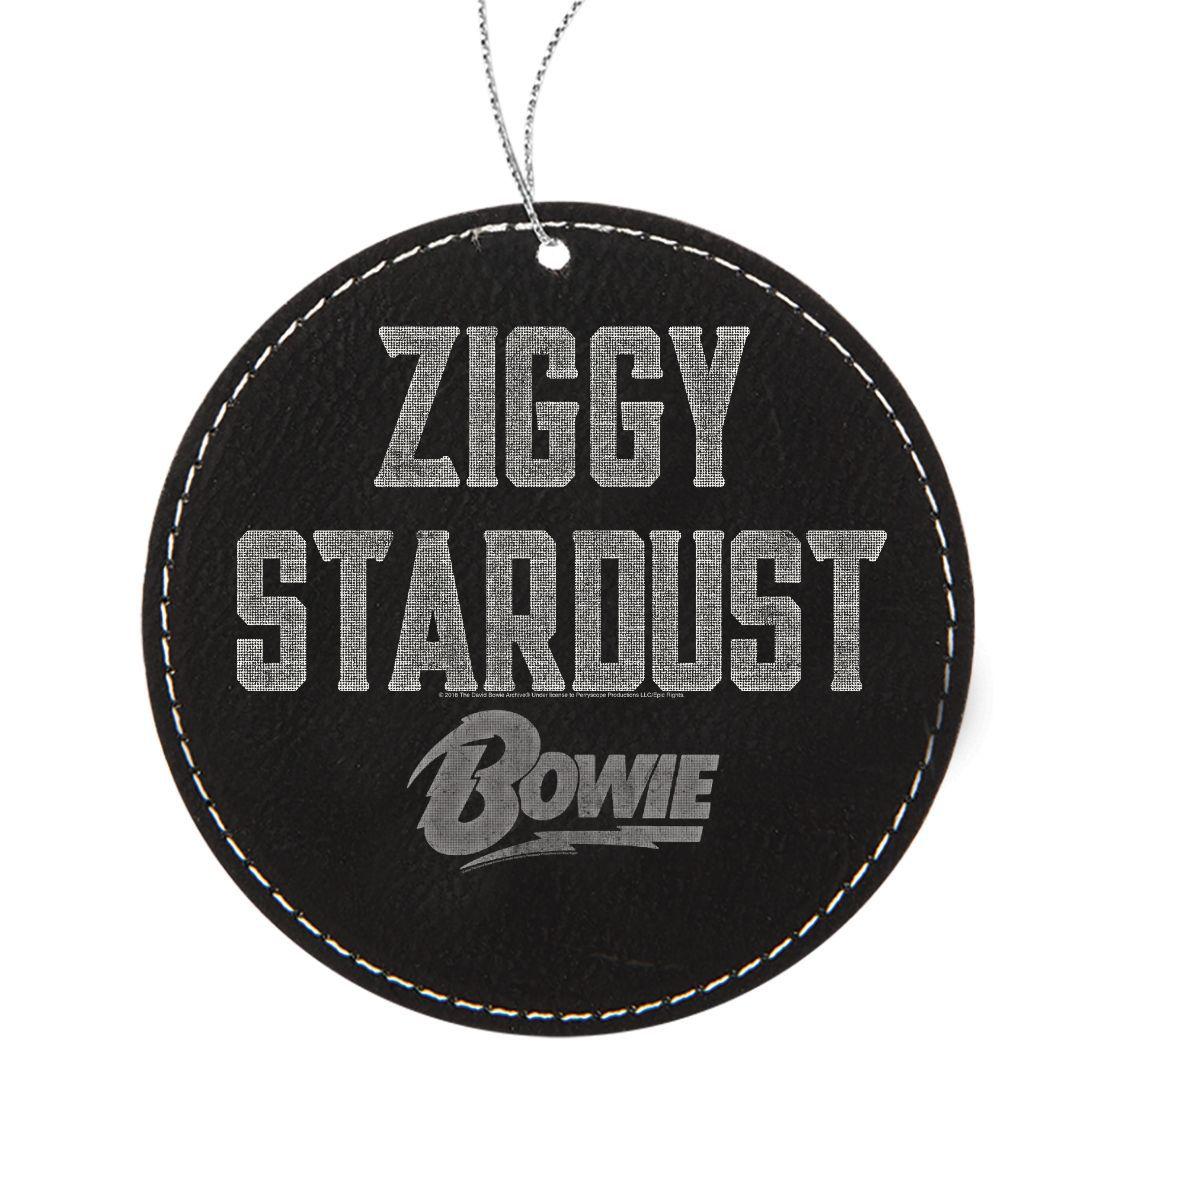 Ziggy Stardust Holiday Ornament